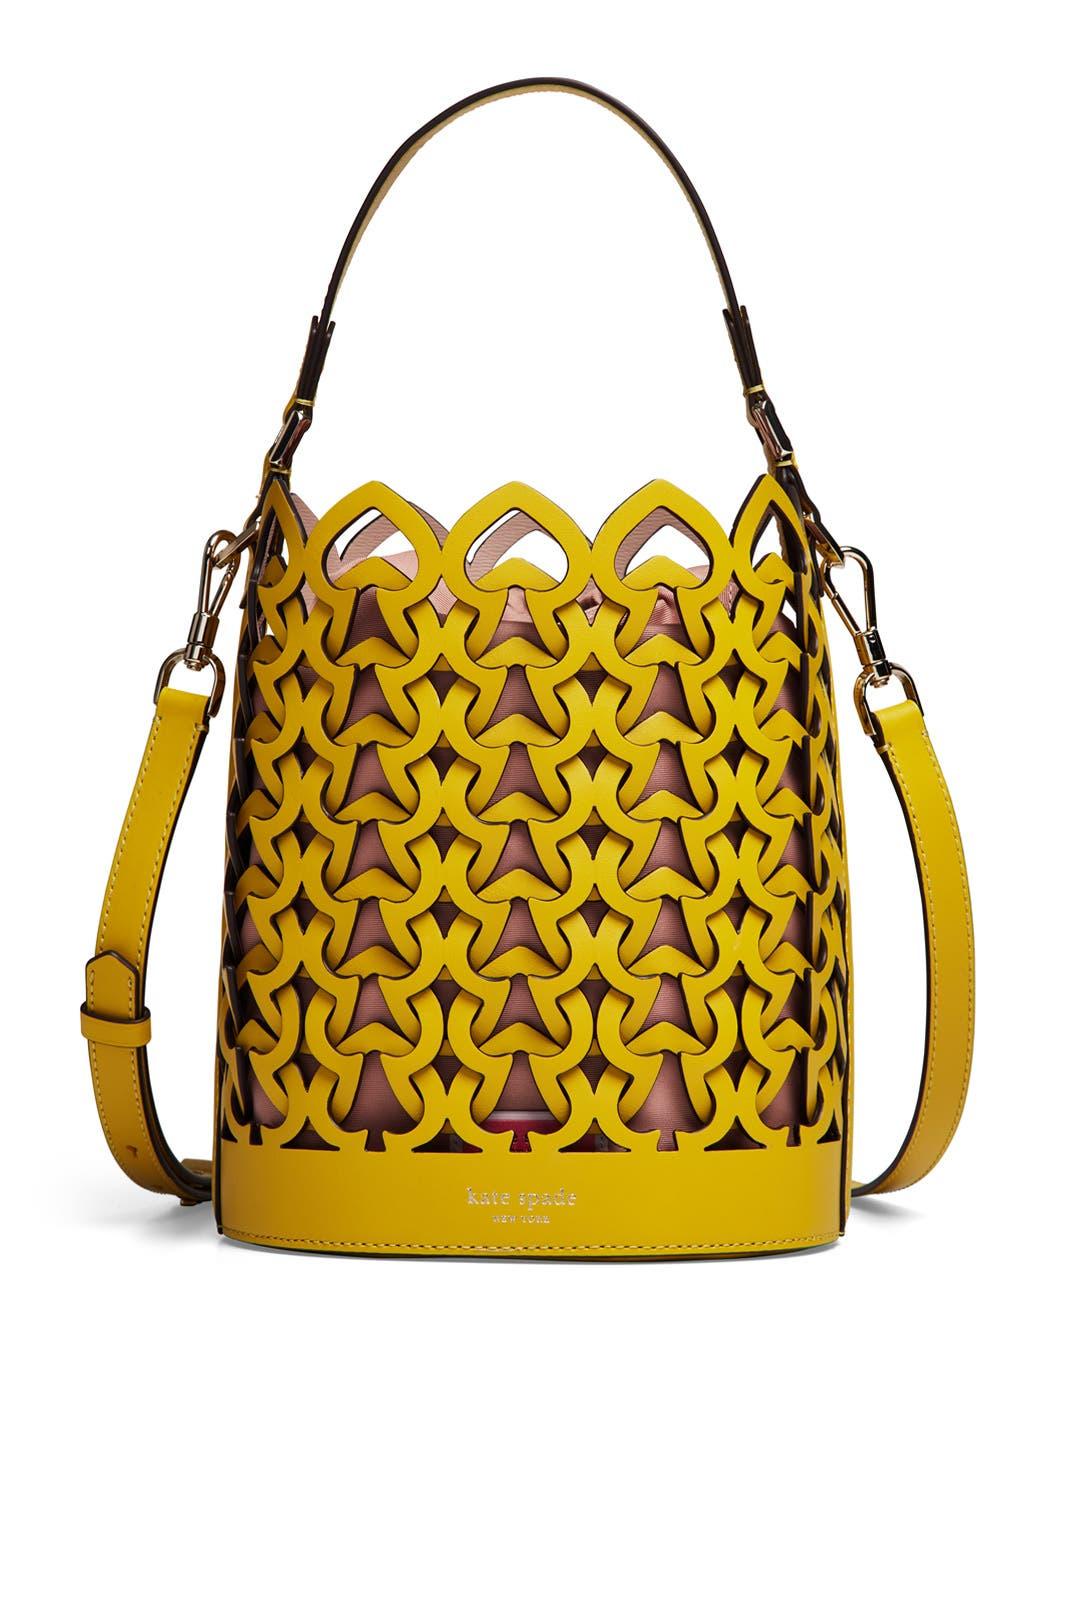 0fe6e32894c kate spade new york accessories Dorie Small Bucket Bag